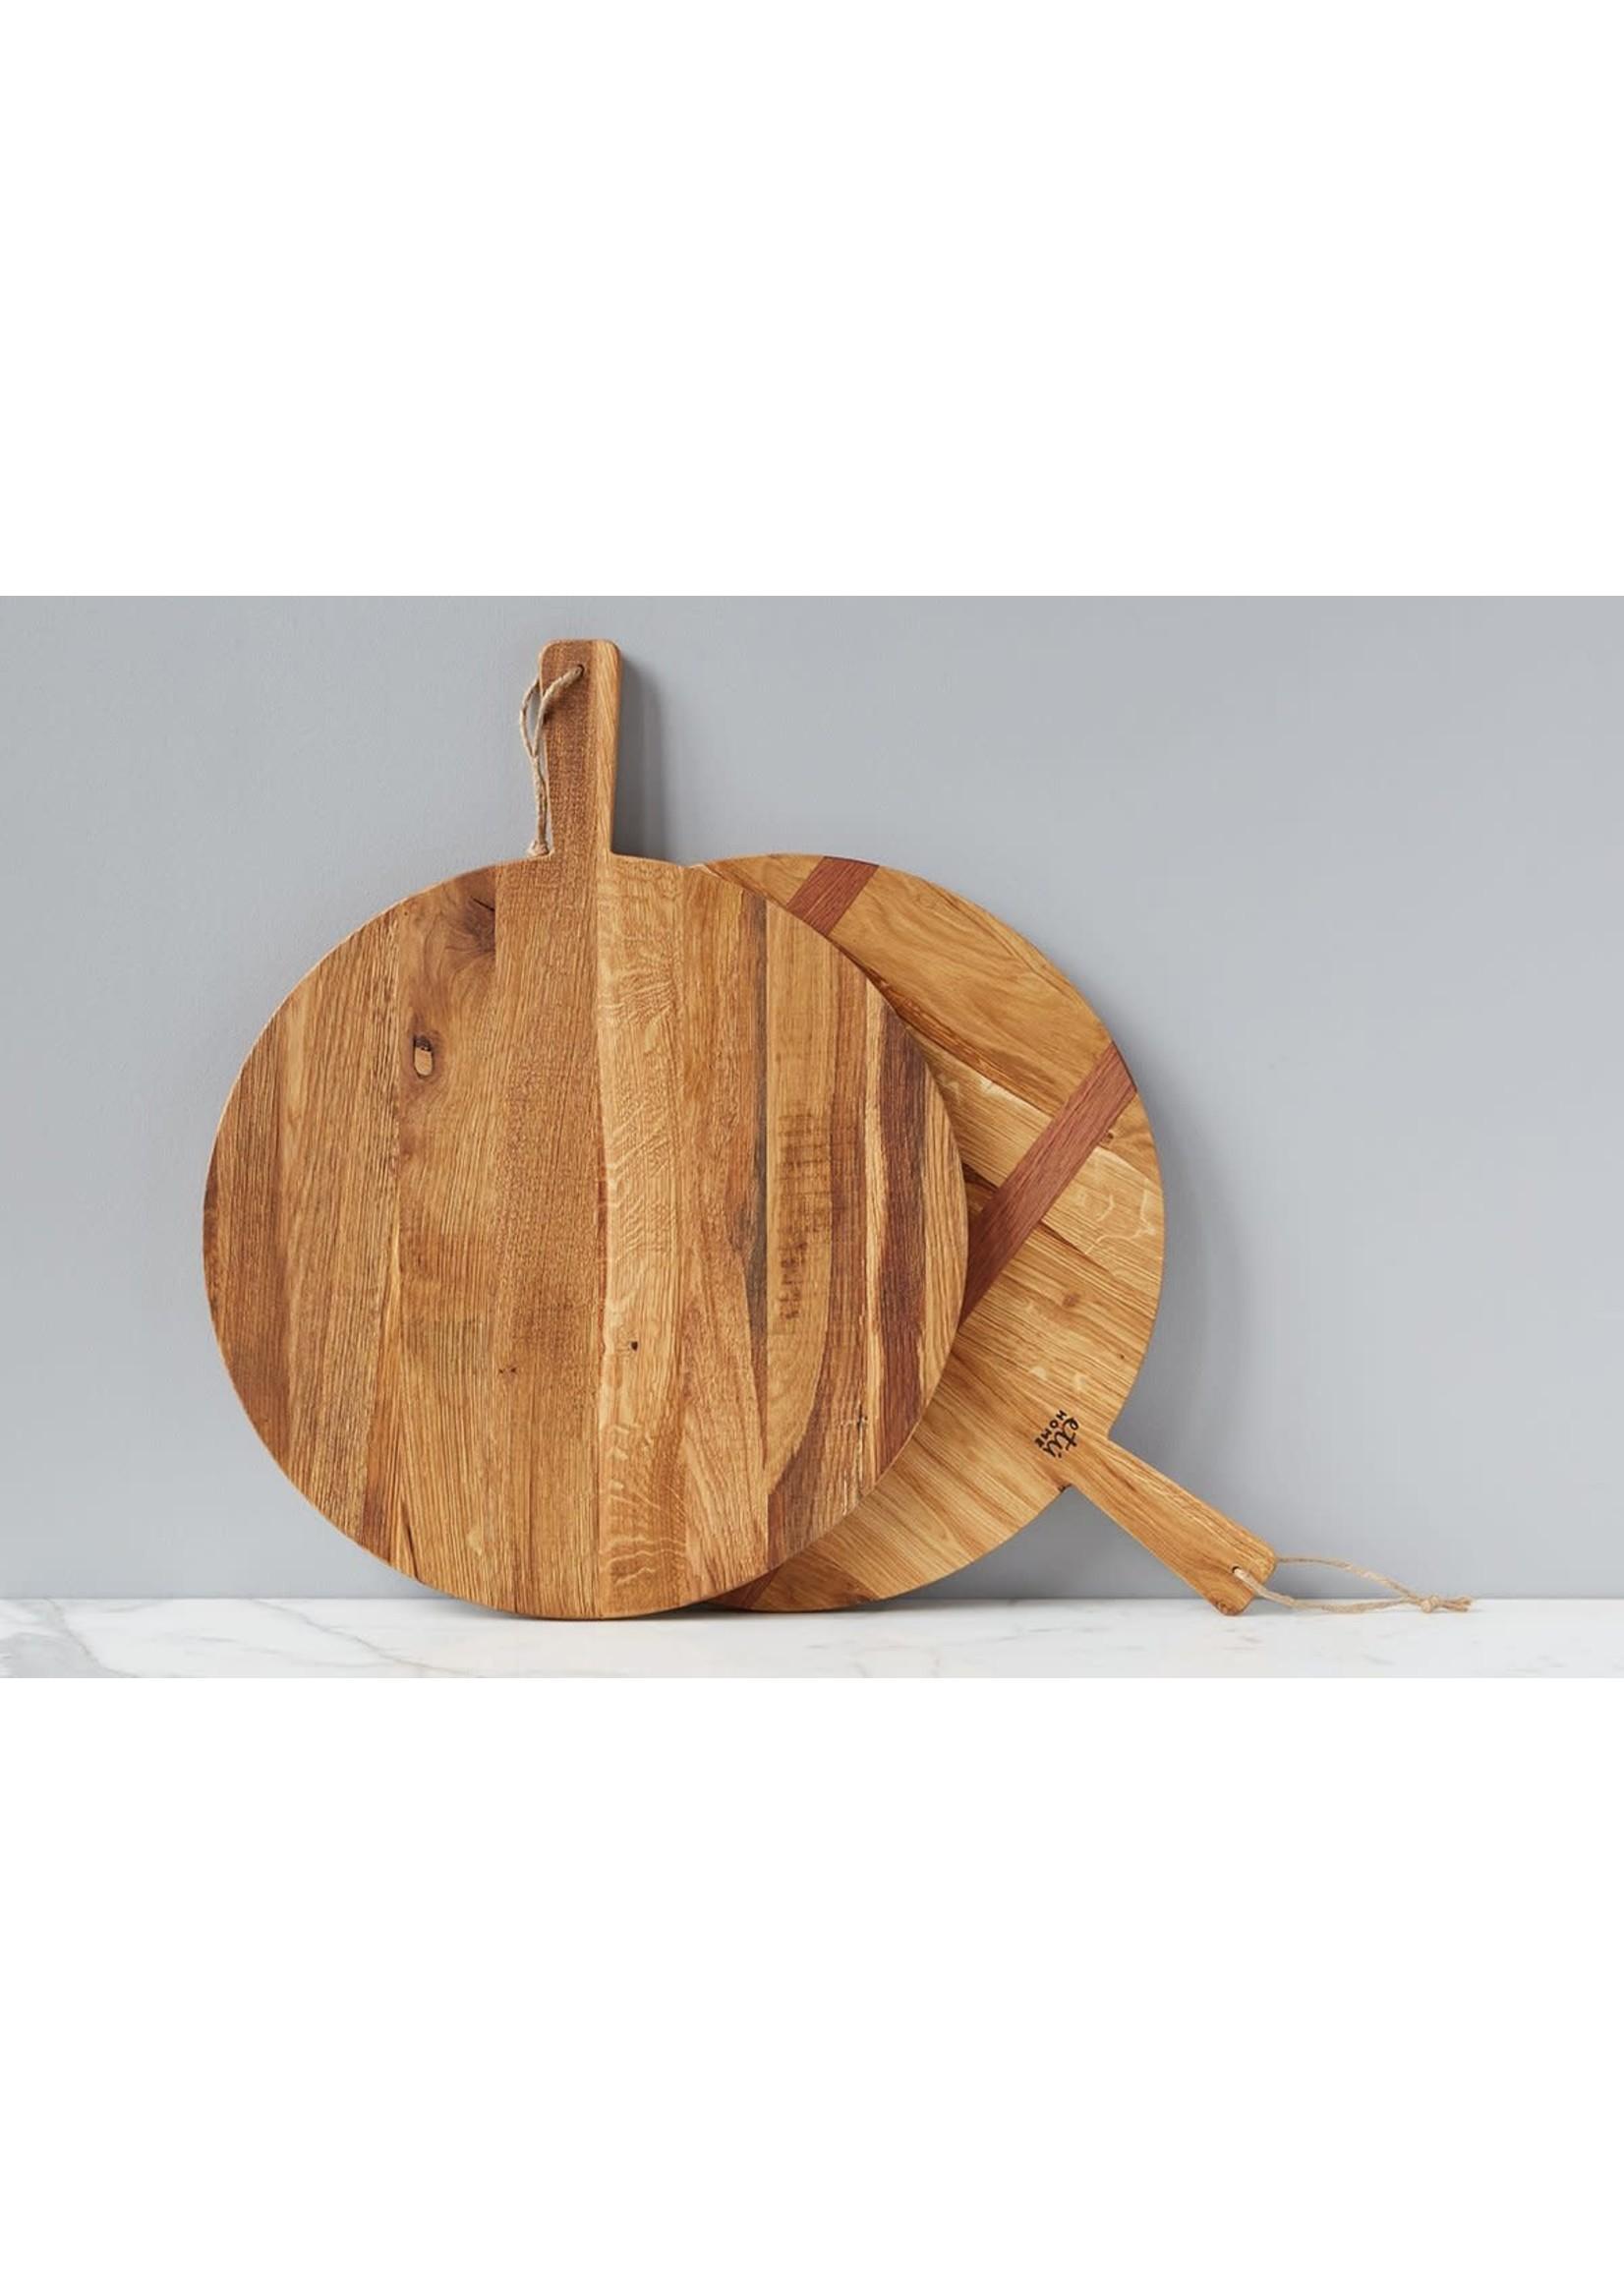 Oak Charcuterie/Pizza Board - Medium